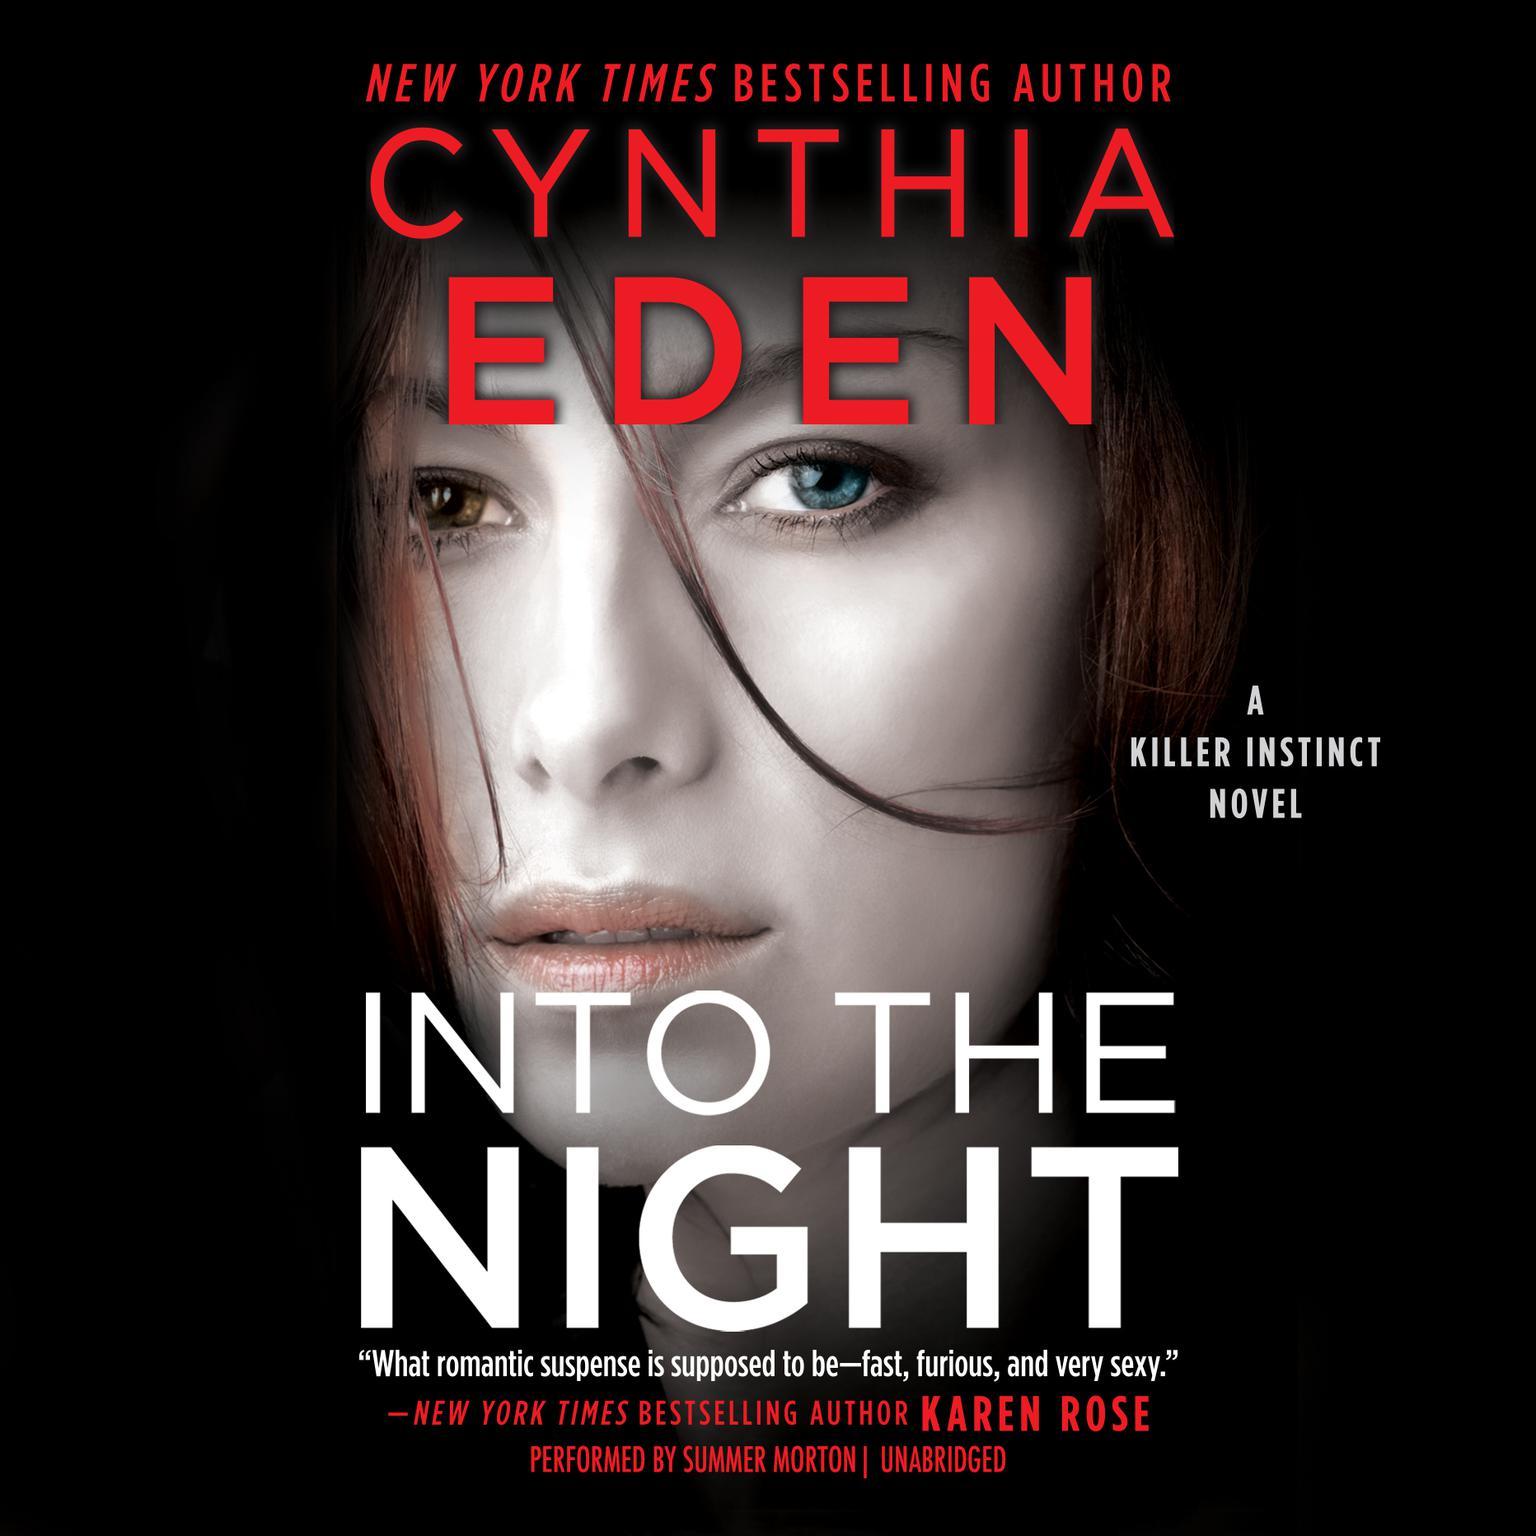 Into the Night: A Killer Instinct Novel Audiobook, by Cynthia Eden